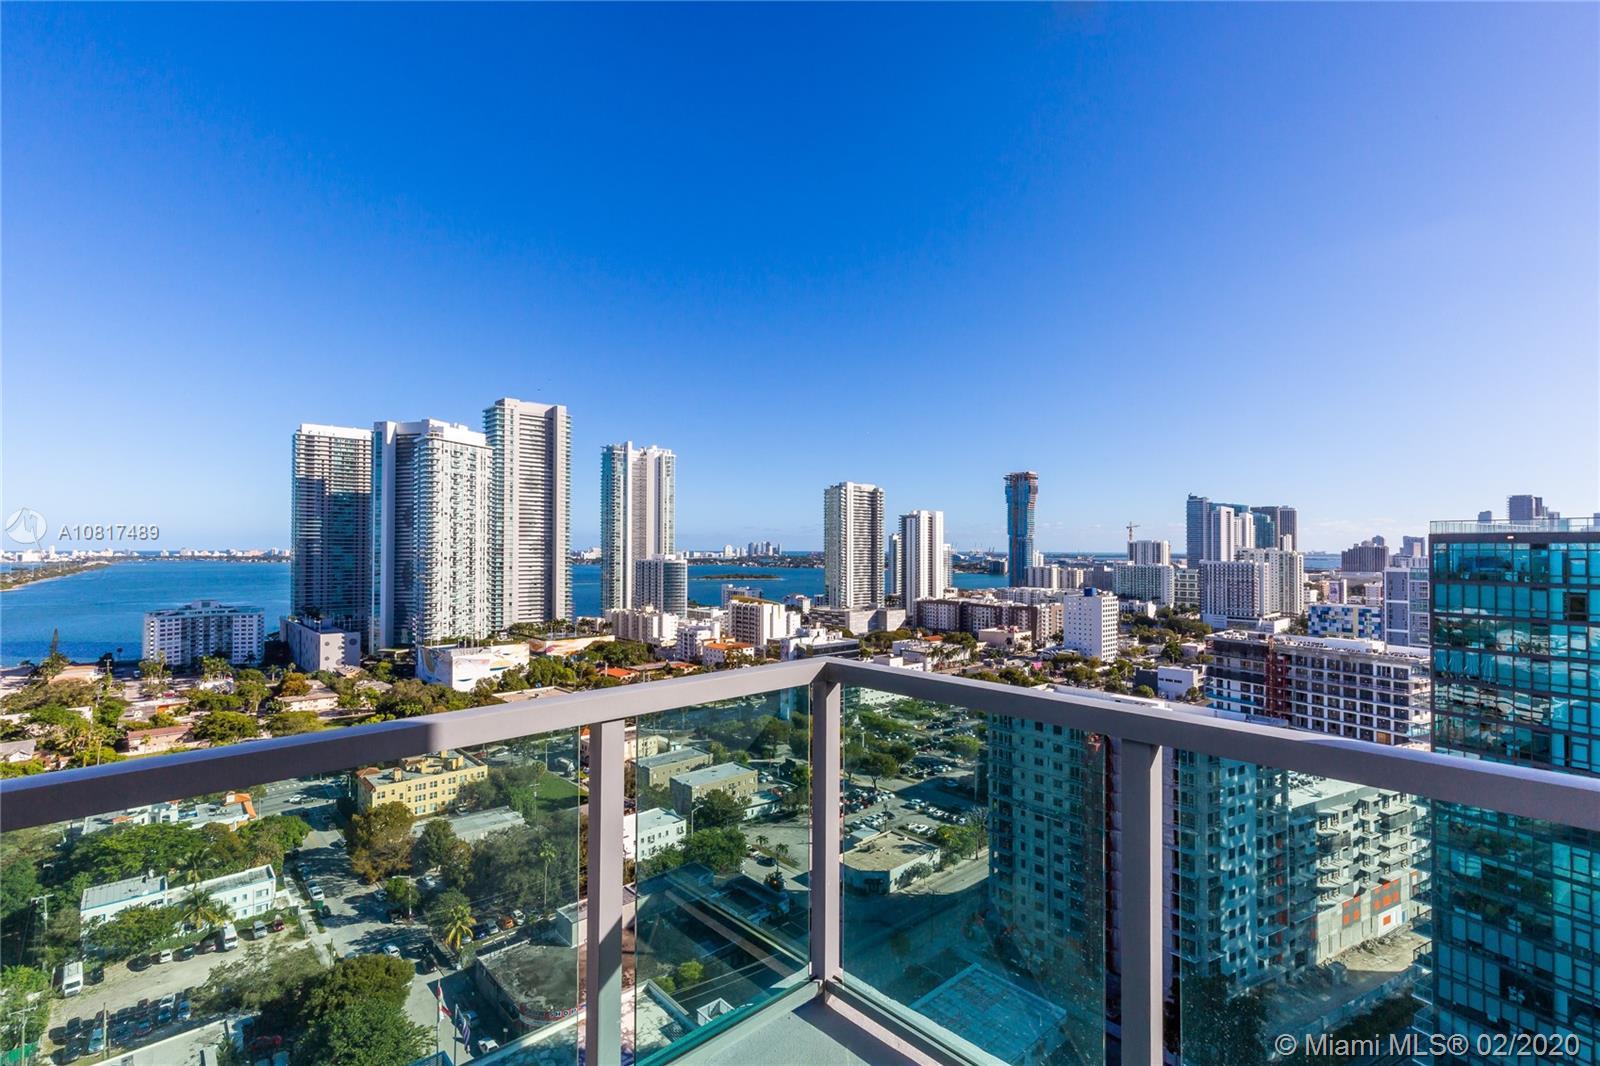 4 Midtown #H2412 - 3301 NE 1st Ave #H2412, Miami, FL 33137